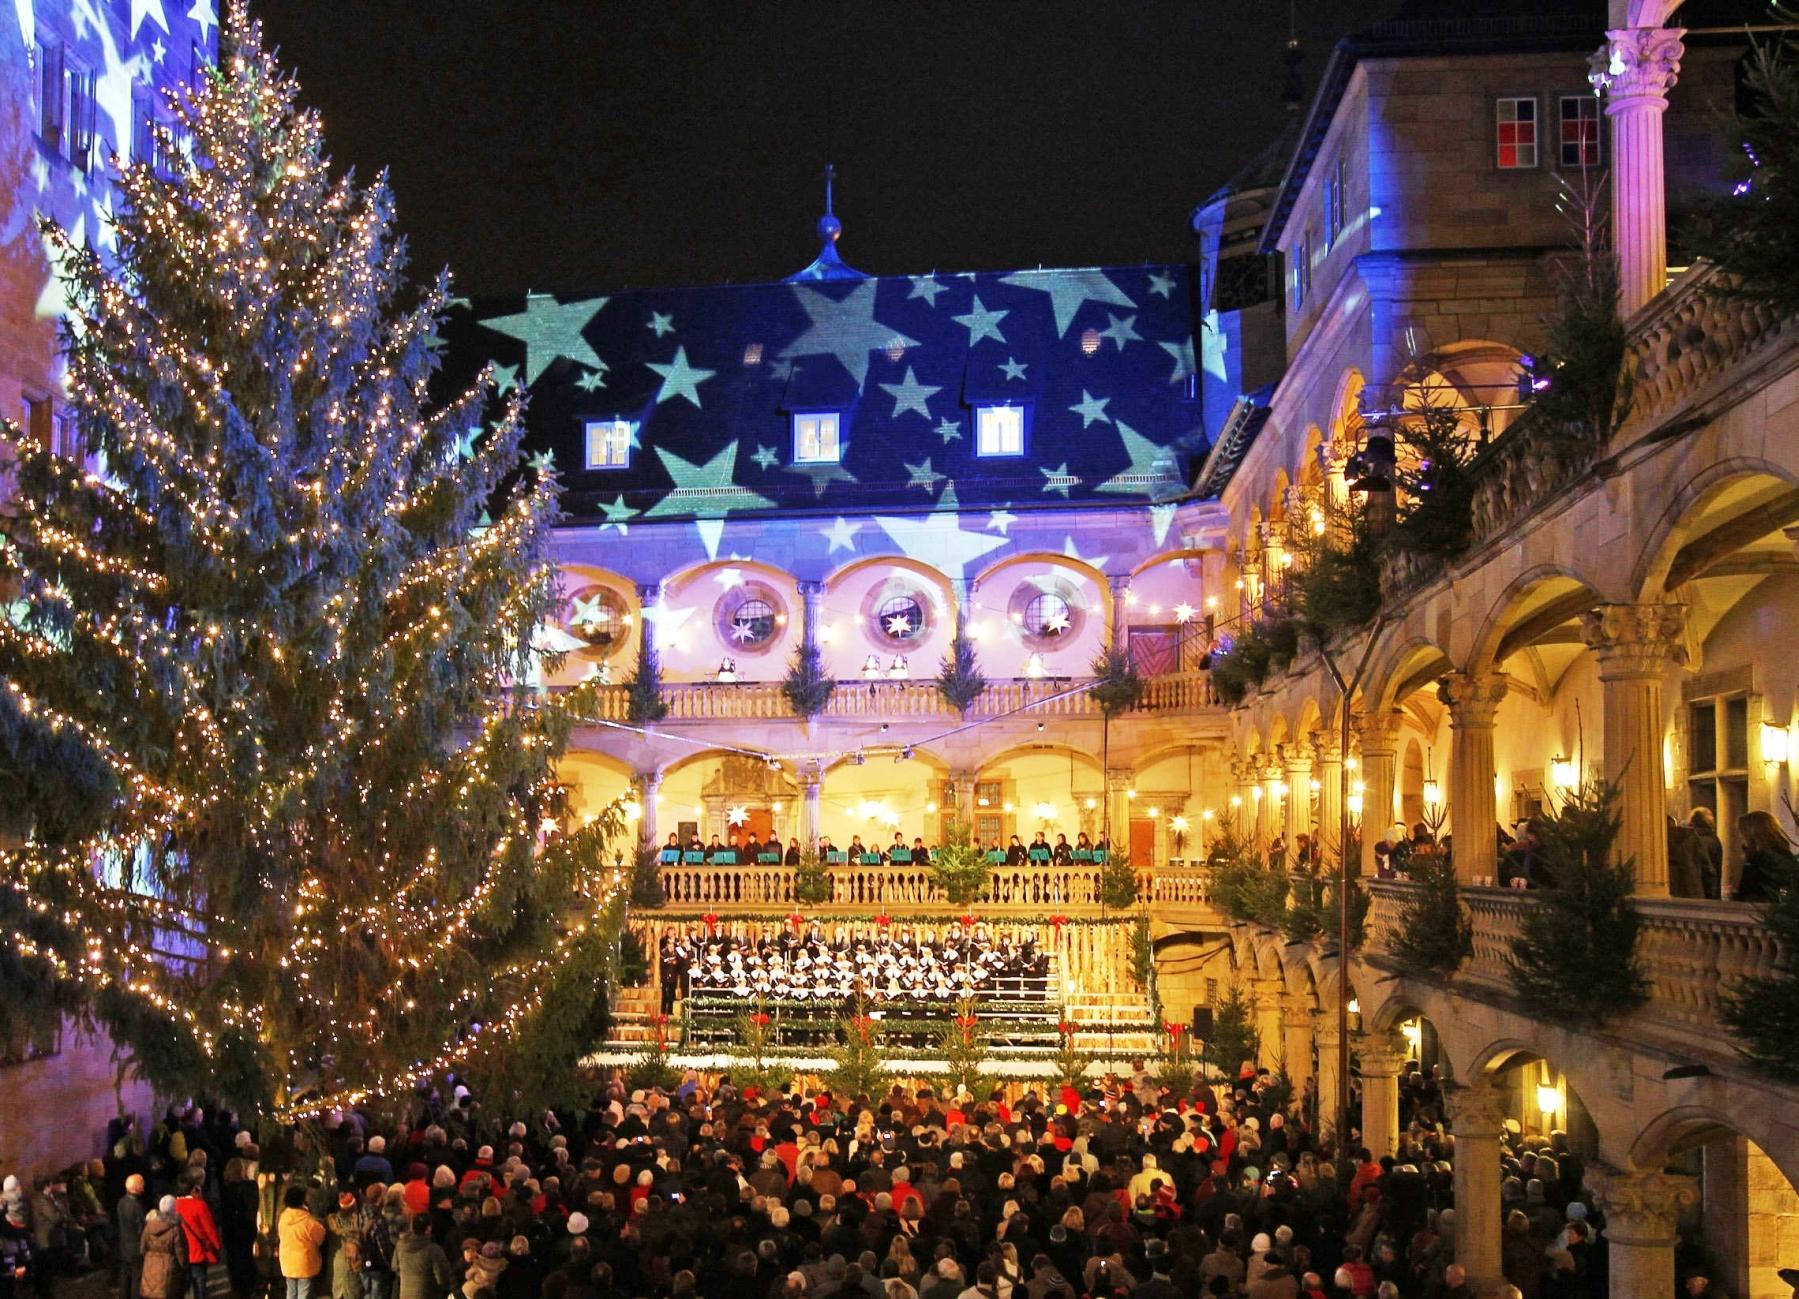 Stuttgart's Alte Schloss at Christmas